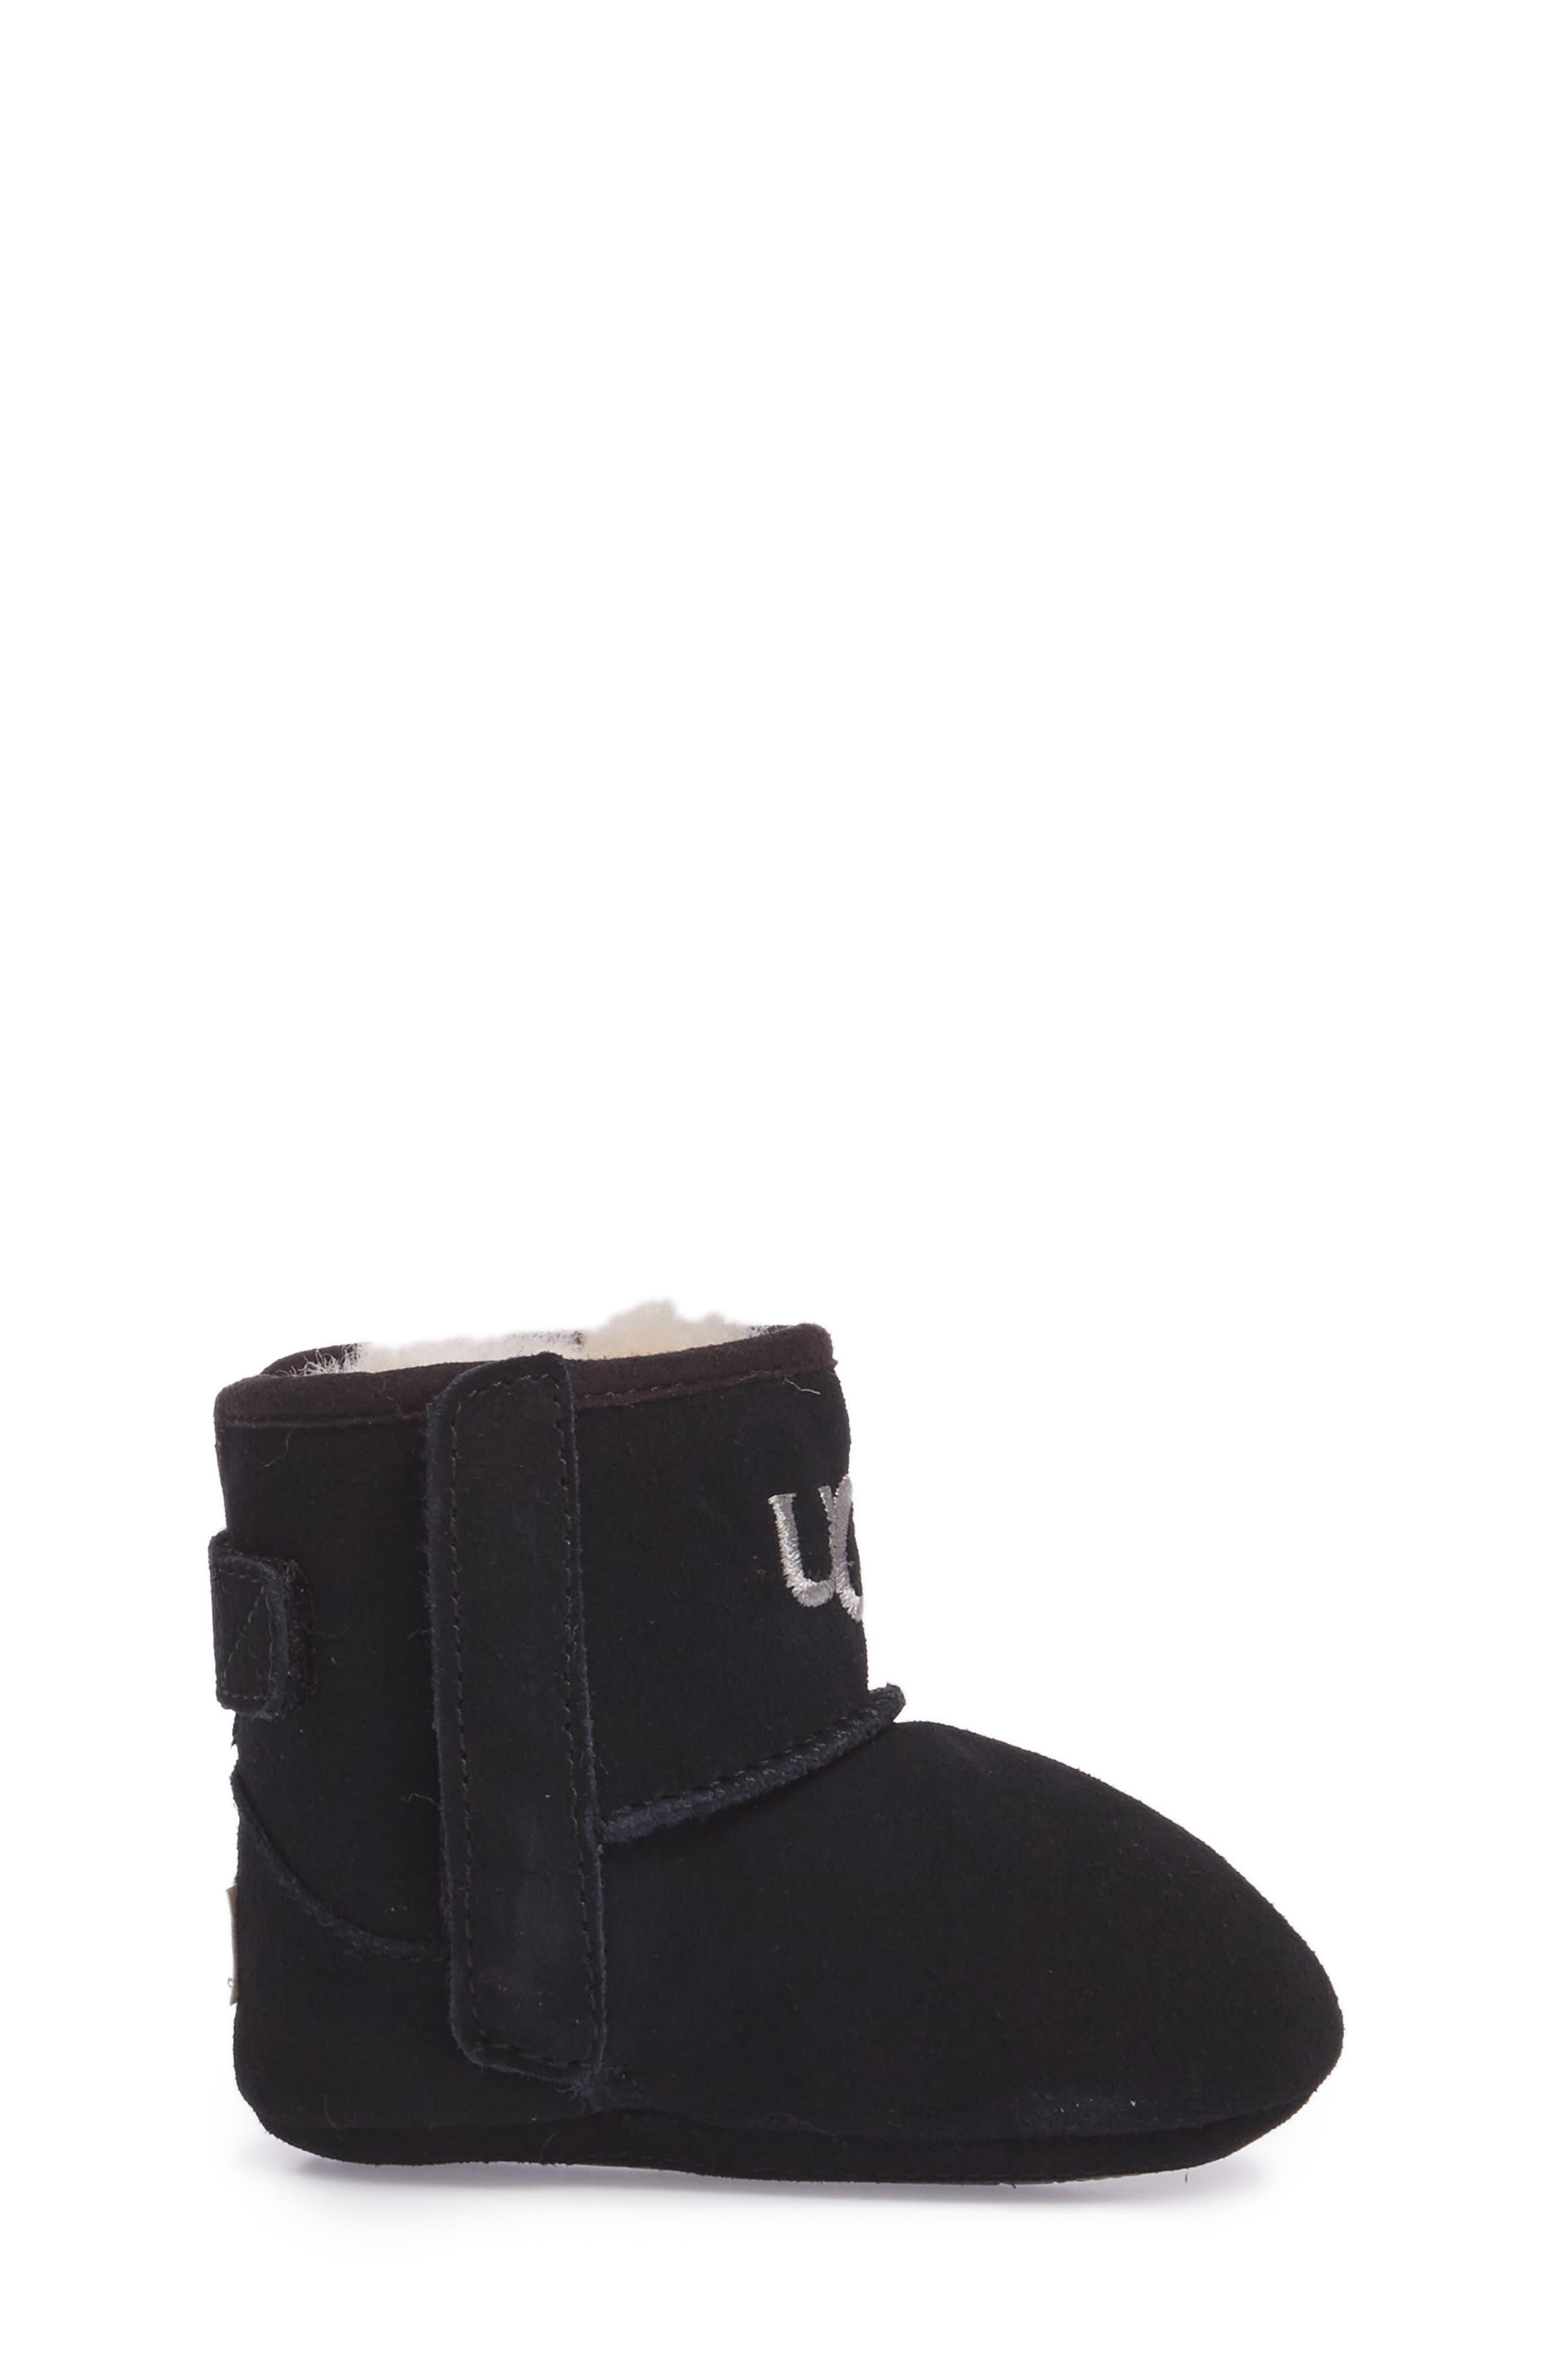 Alternate Image 3  - UGG® Jesse II Bow Boot (Baby & Walker)